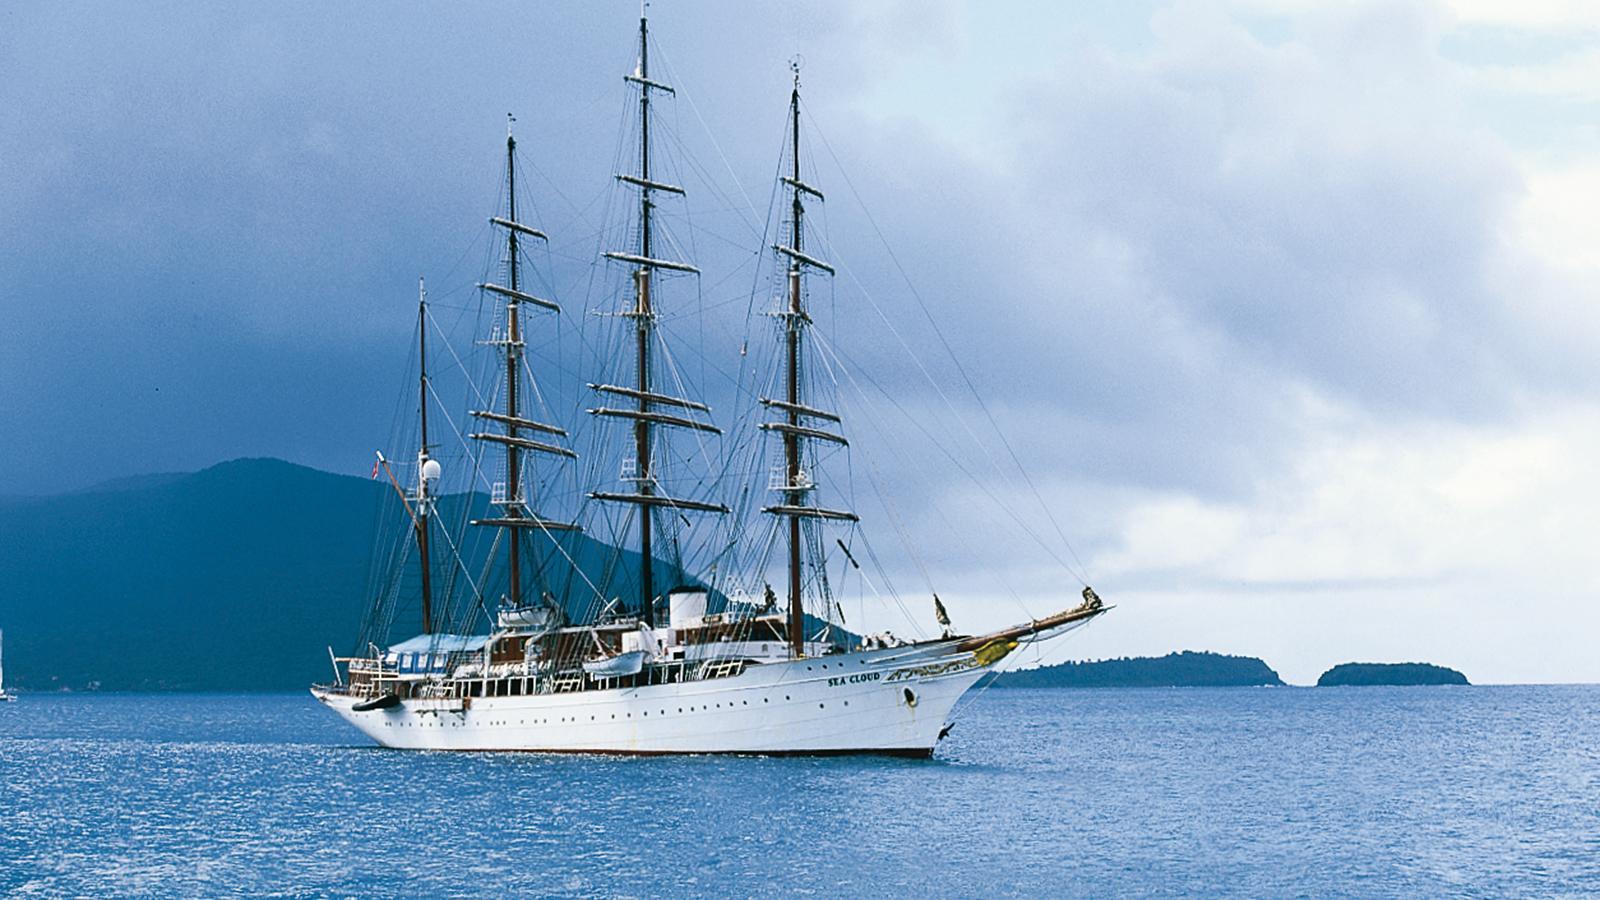 sea-cloud-super-yacht-sailing-boat